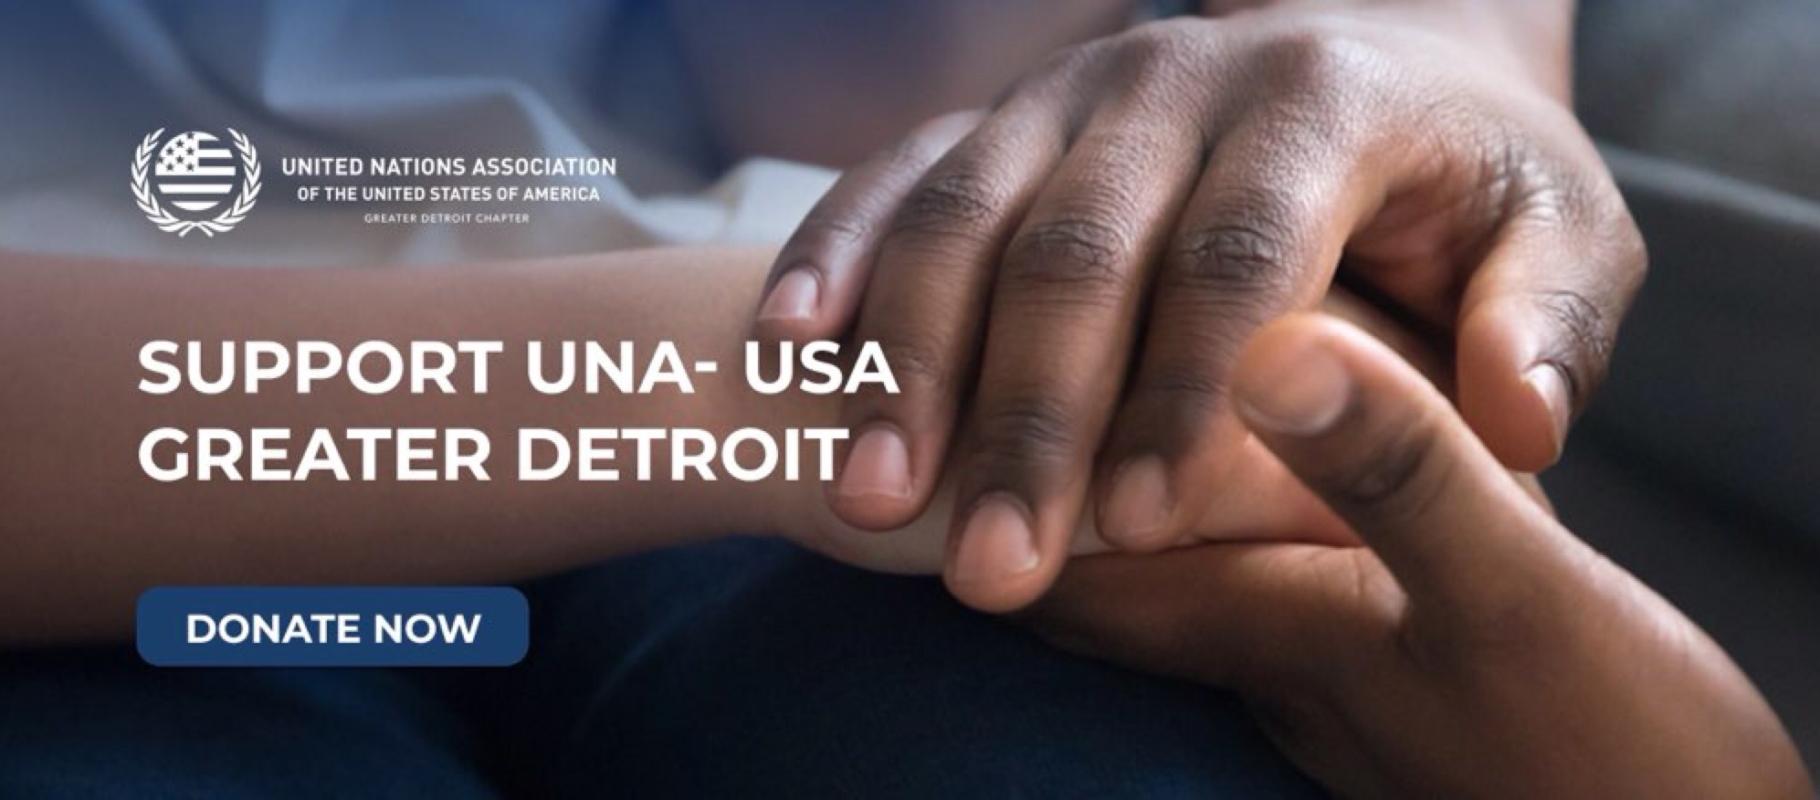 http://www.unadetroit.org/donation/